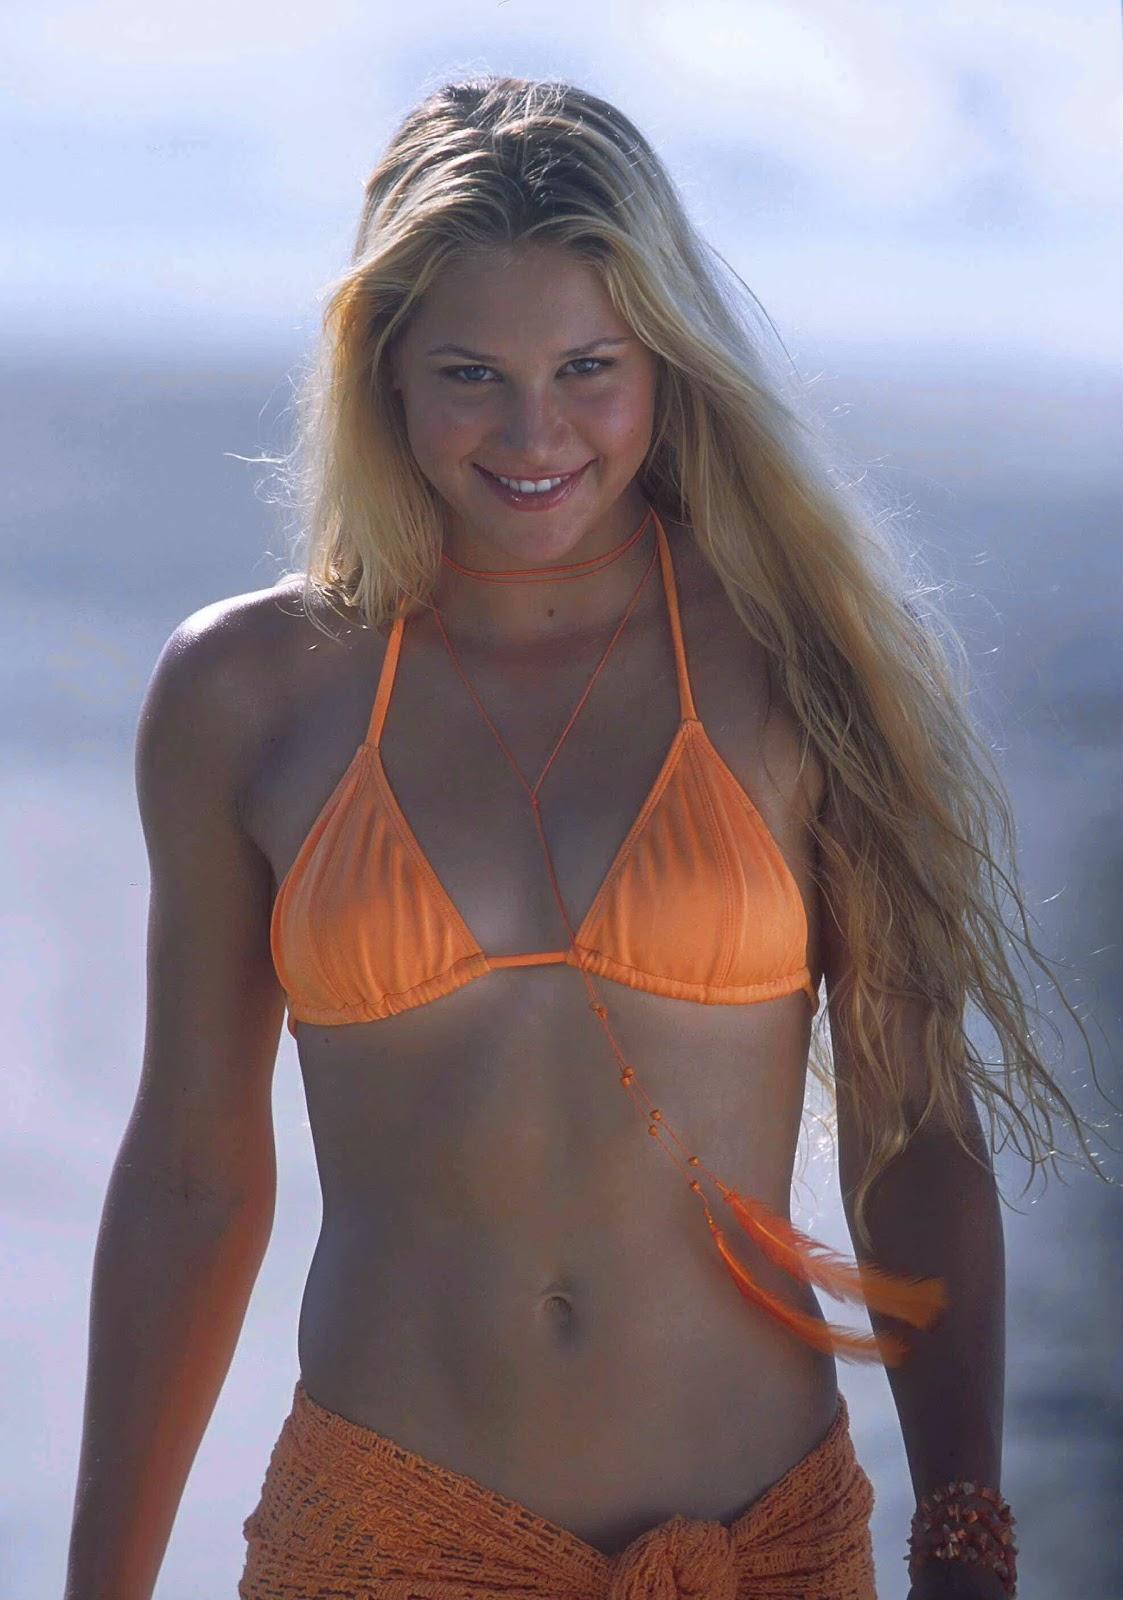 The Hottest Anna Kournikova Photos - 12thBlog